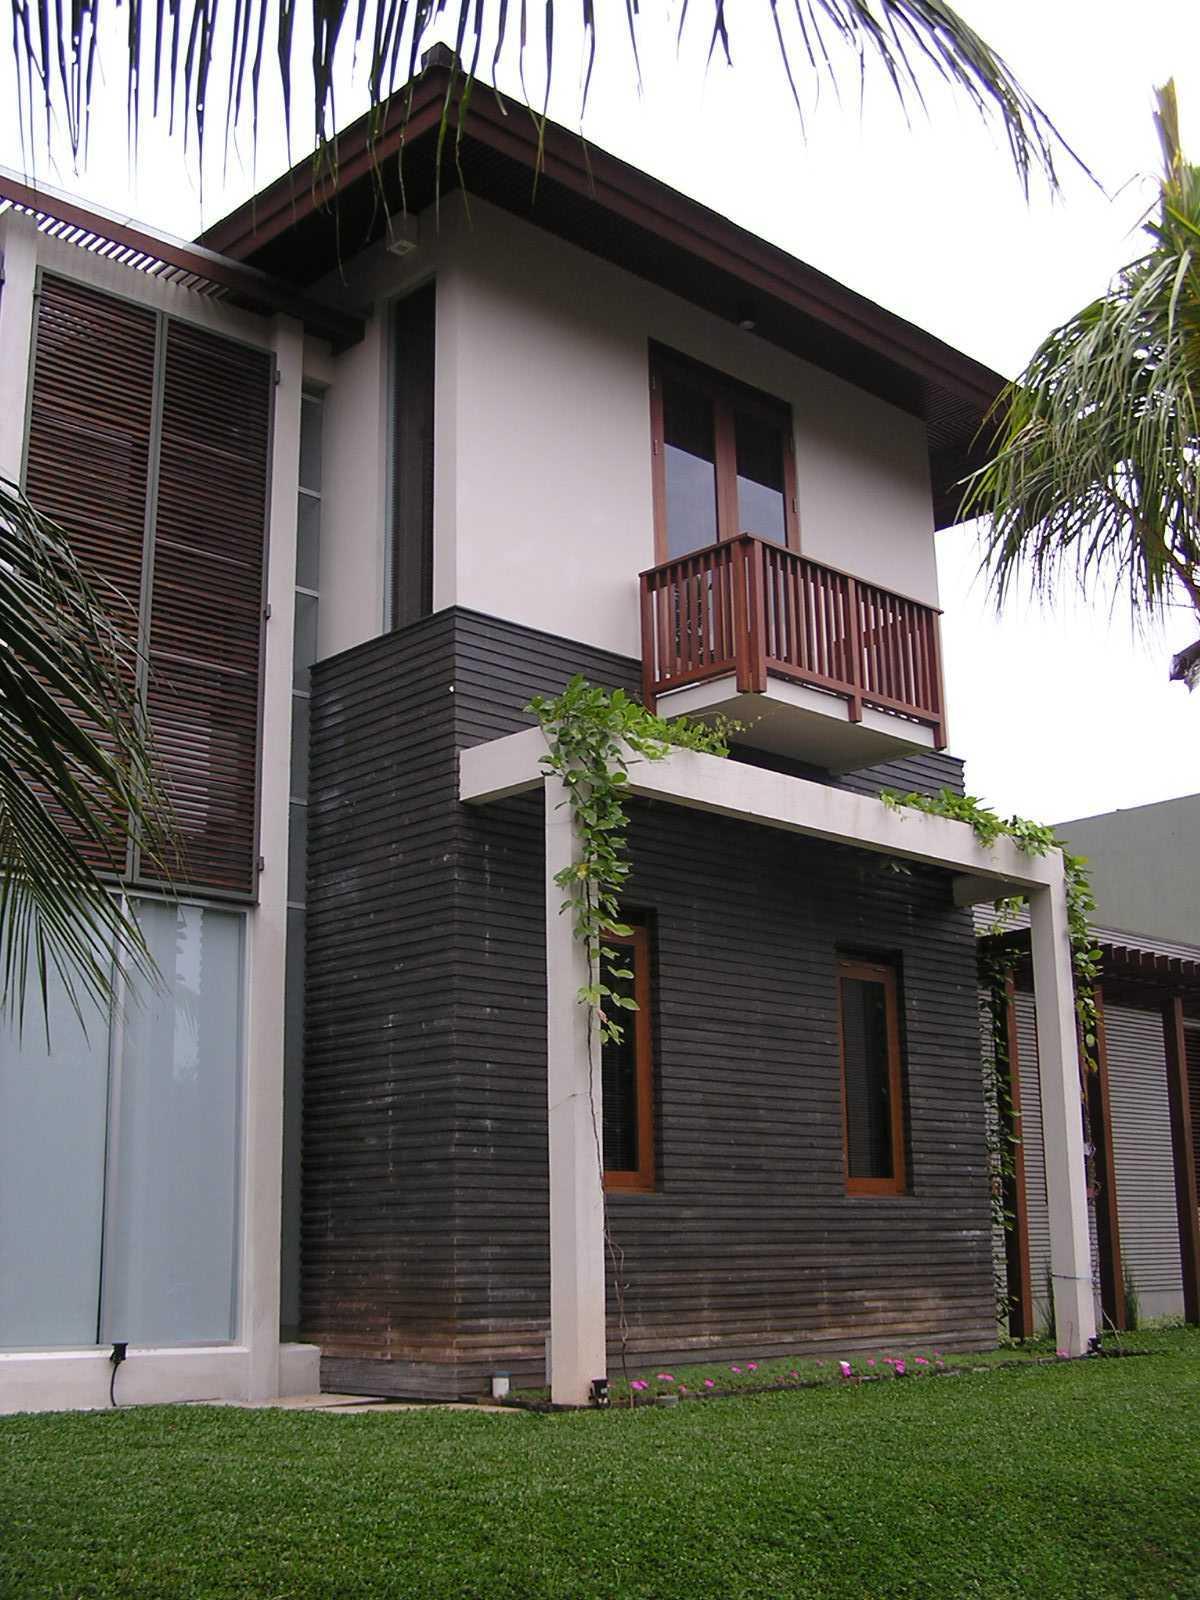 Pt. Garisprada Bintaro Residence Bintaro, Pesanggrahan, South Jakarta City, Jakarta, Indonesia Bintaro P1145539 Tropis  22380